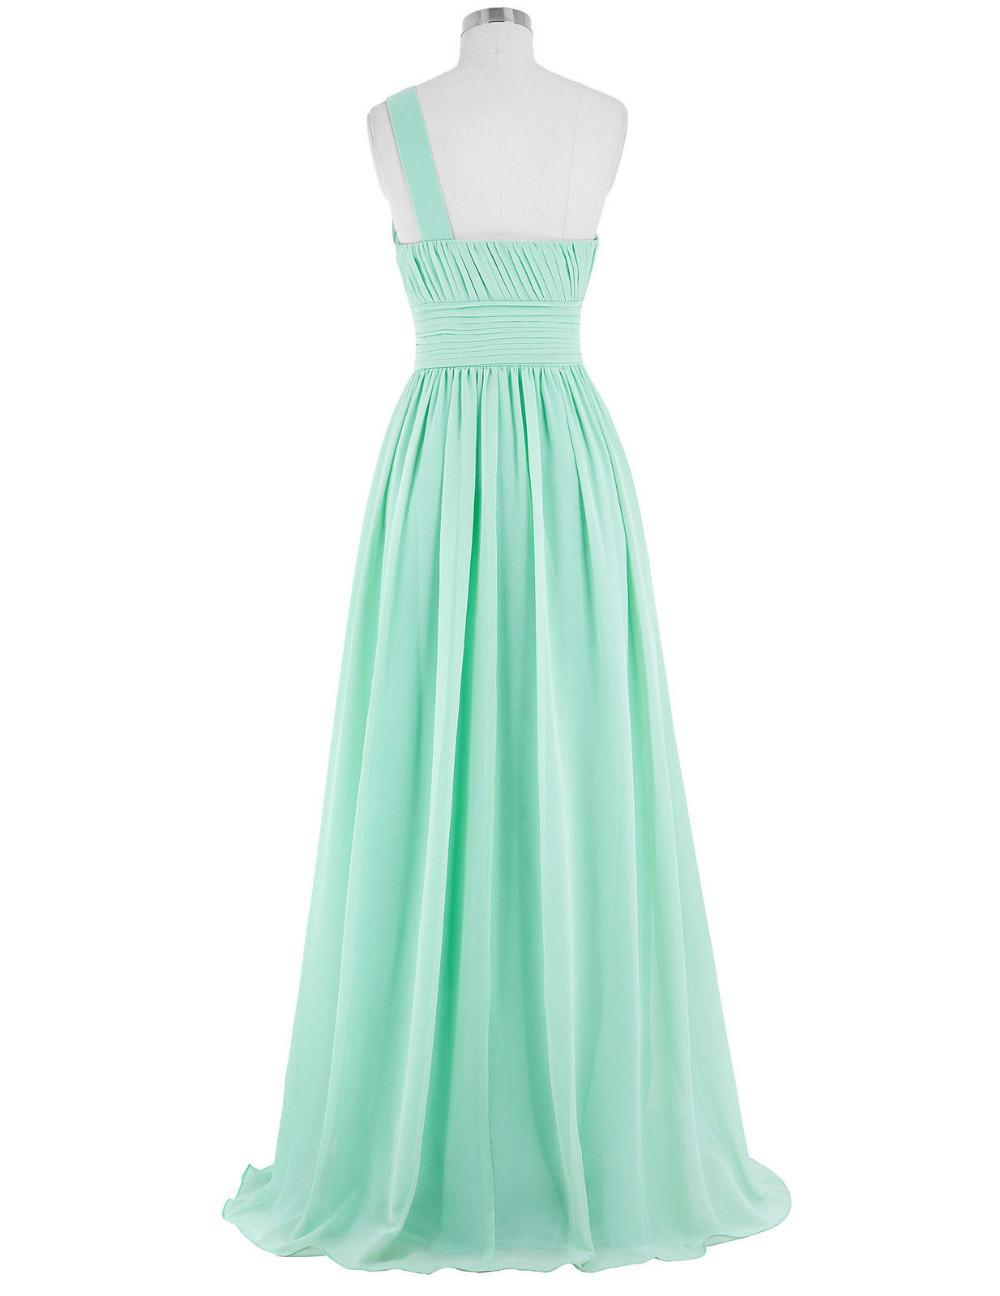 Kate Kasin Mint Green Bridesmaid Dresses Long Wedding Party Dresses One Shouler Bruidsmeisjes Jurk Pink Bridemaid Dress 0200 9